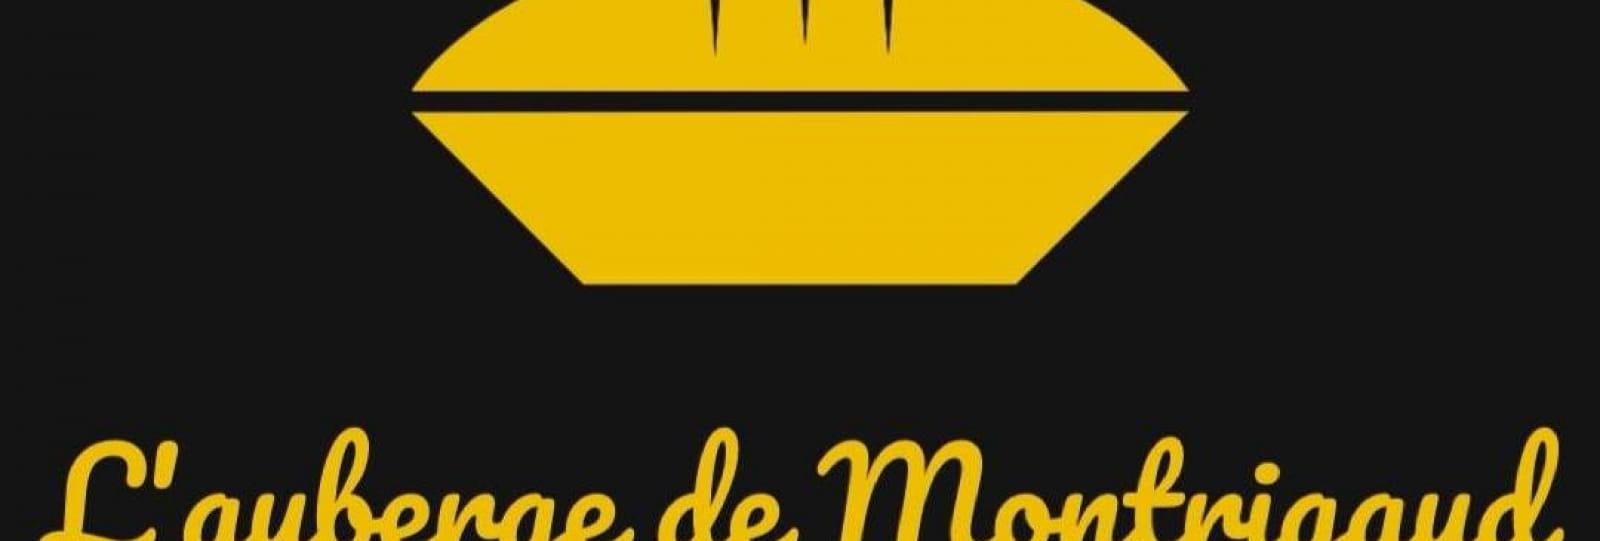 Auberge de Montrigaud